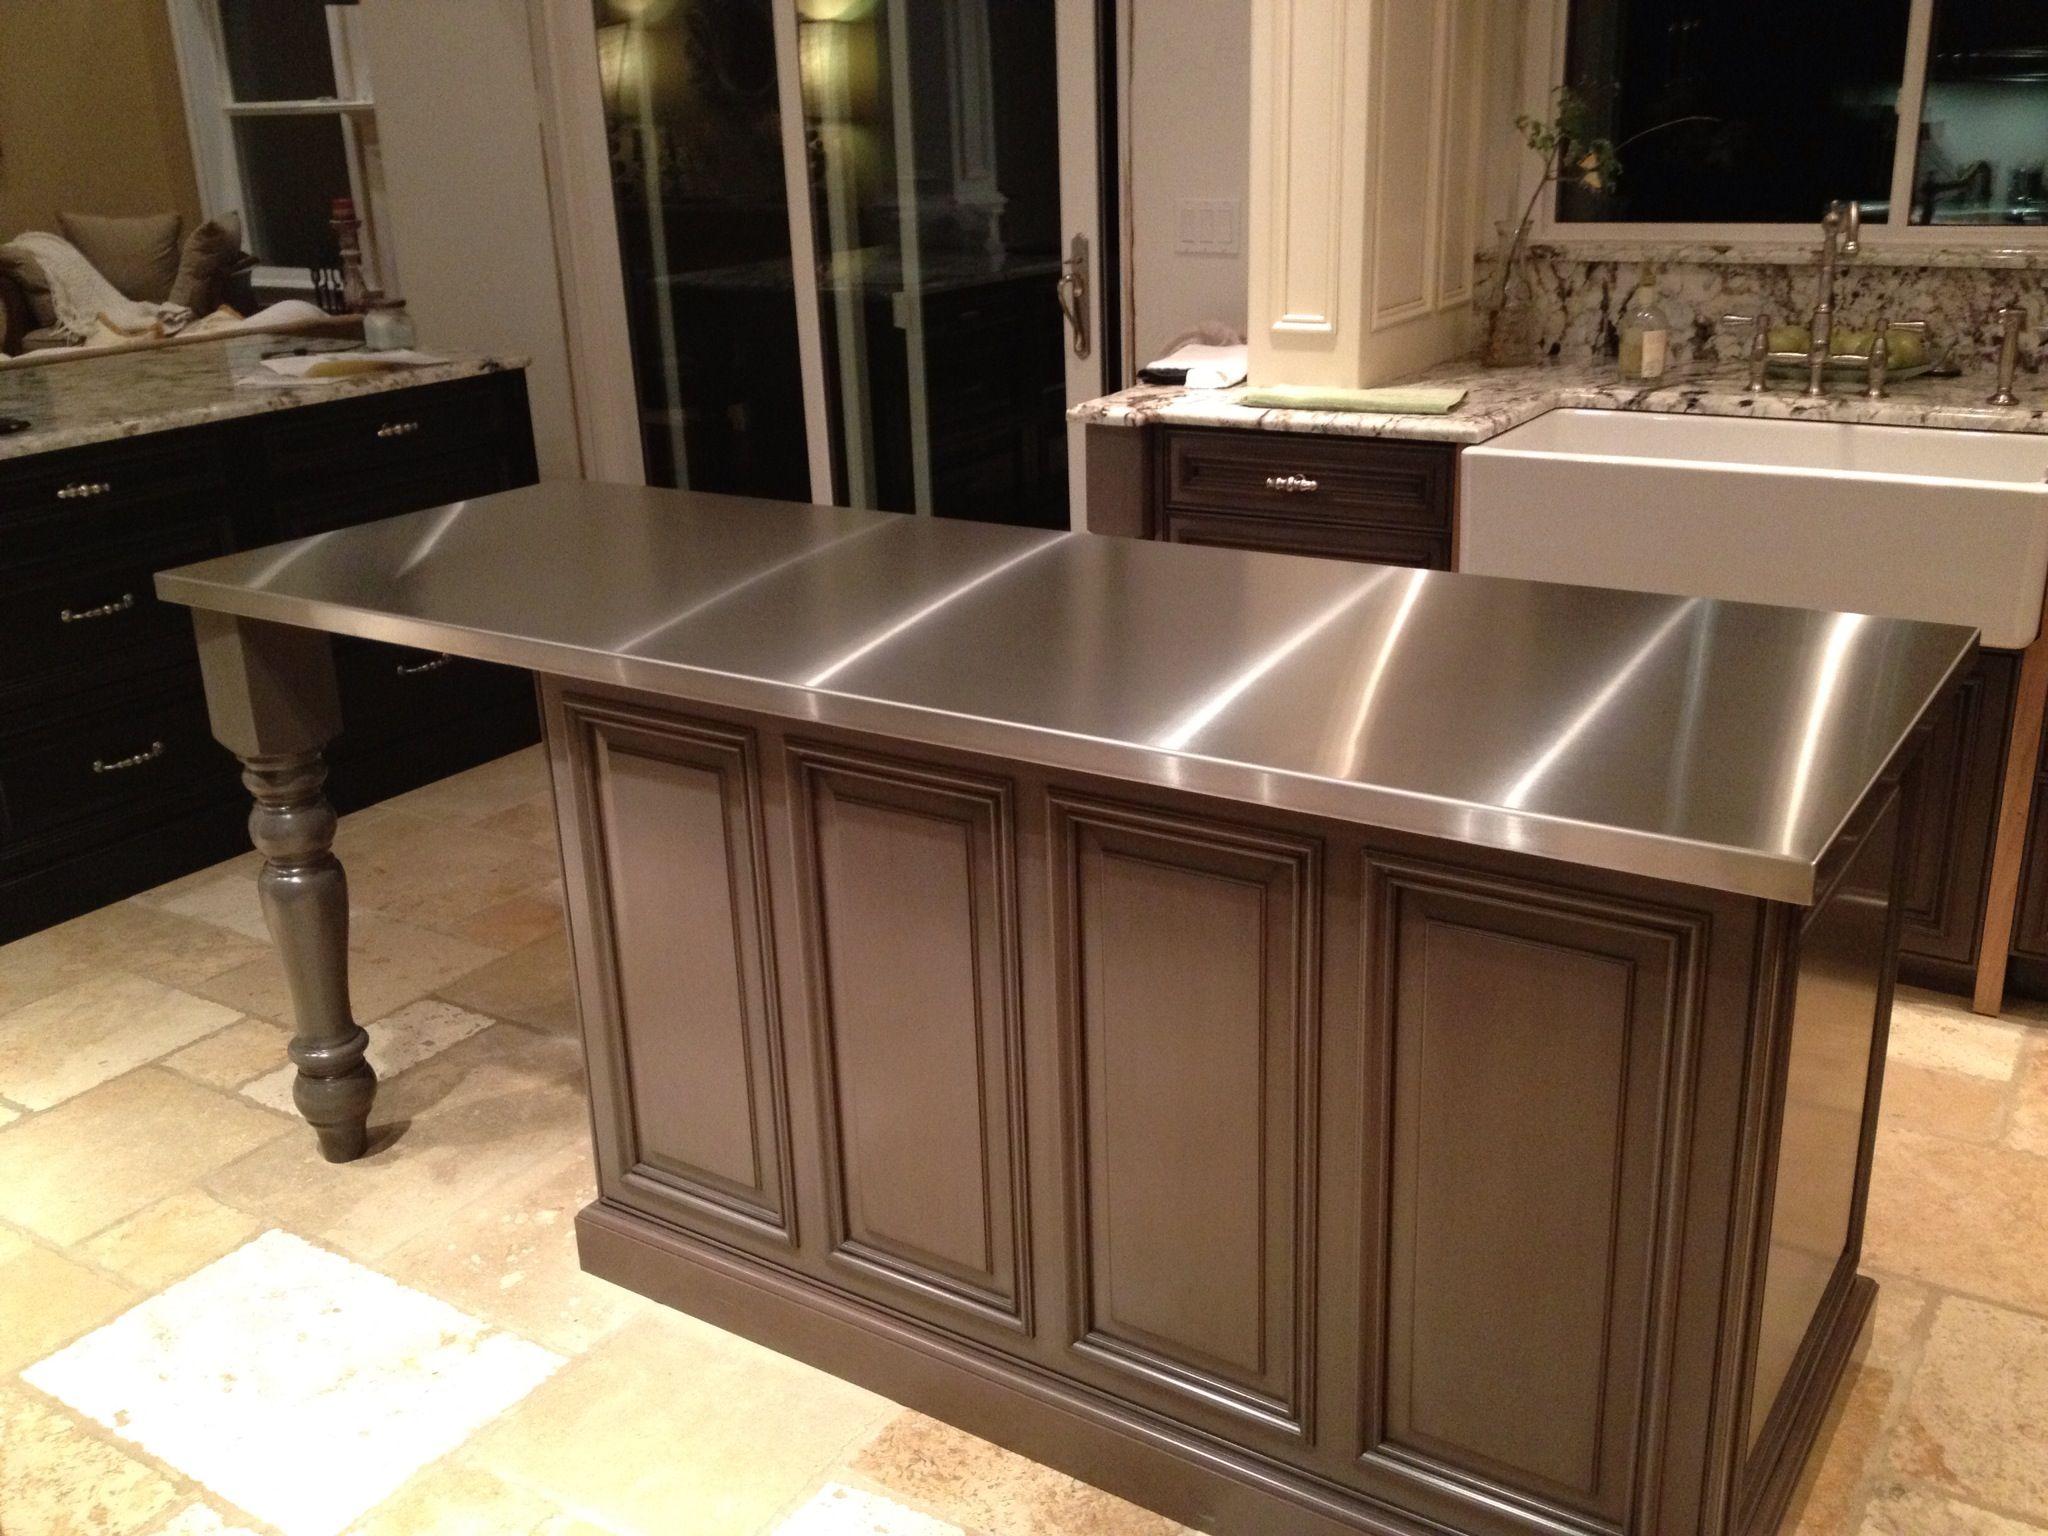 Stainless Steel Island Stainless Steel Countertops Diy Kitchen